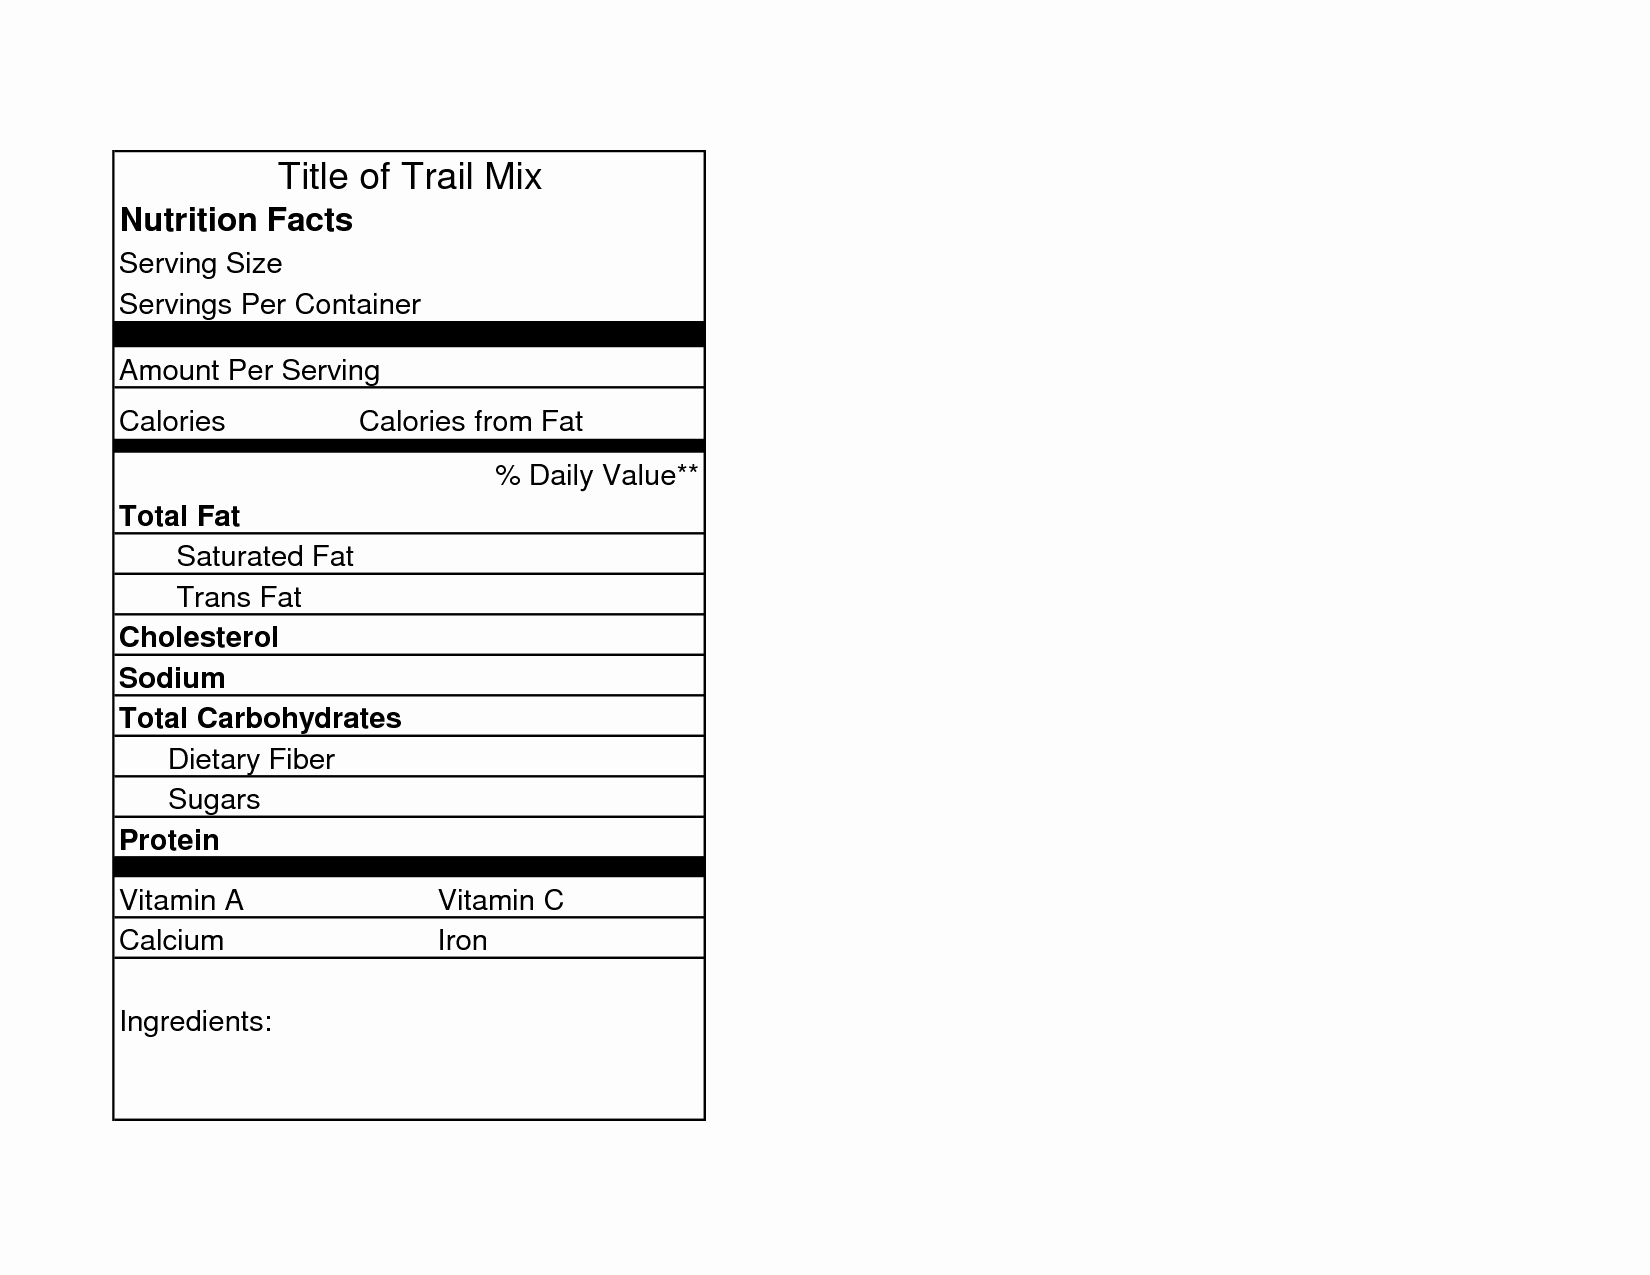 Nutrition Facts Template Excel Download Unique Nutrition Facts Label Template Microsoft Excel